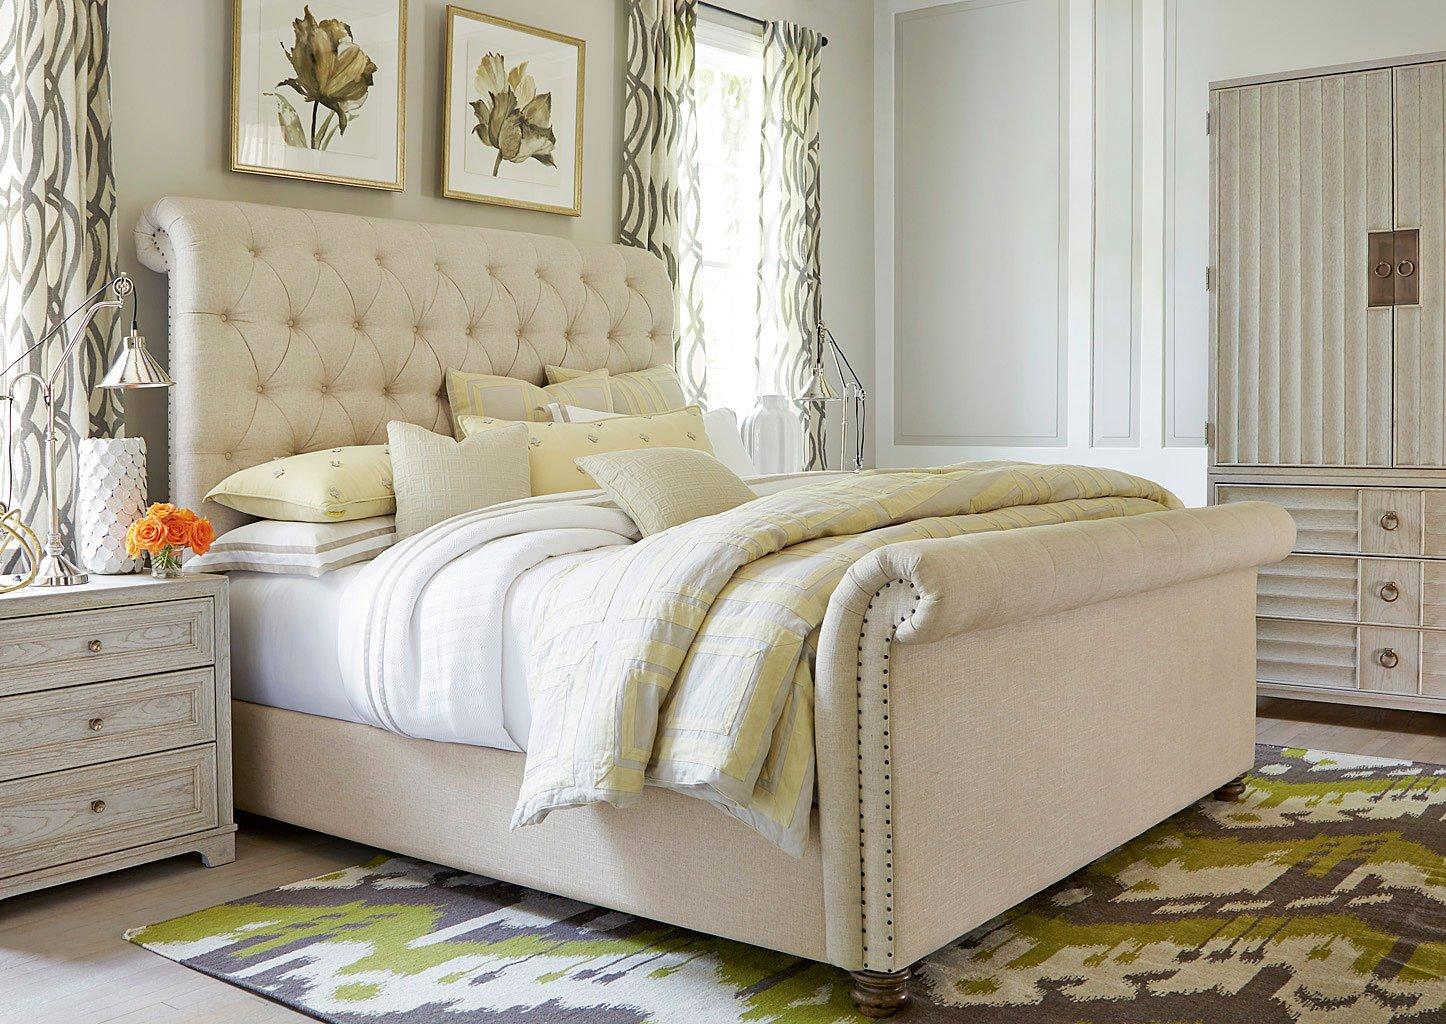 California Bedroom Set W Boho Chic Bed Malibu Universal